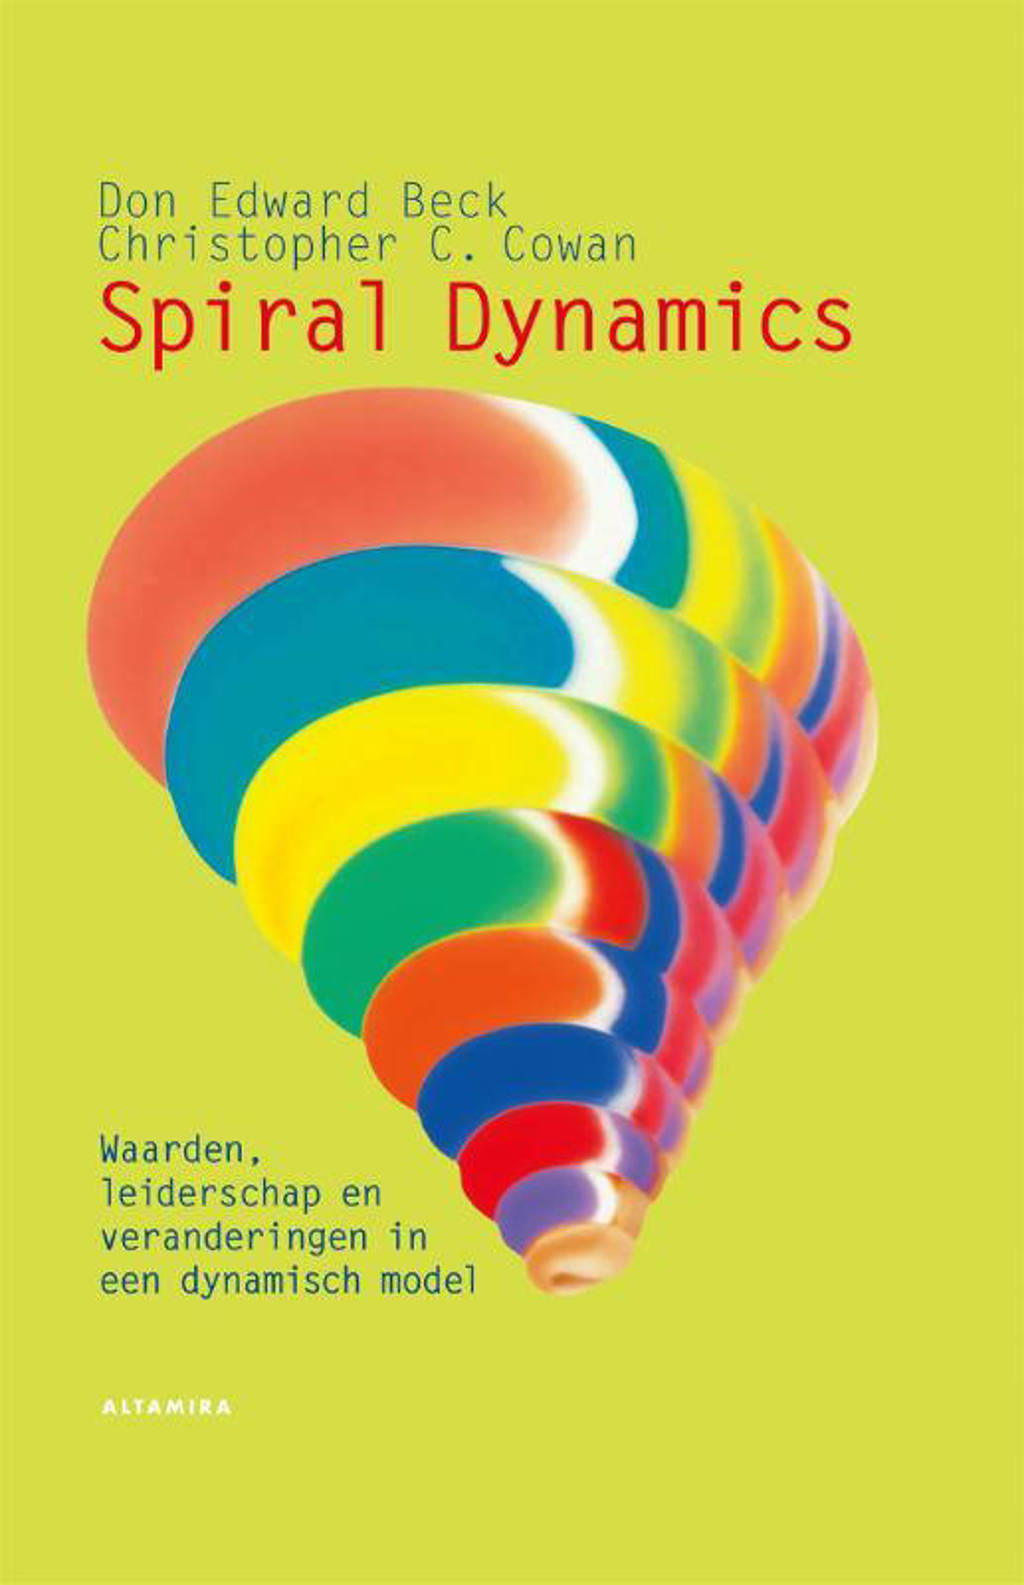 Spiral dynamics - Don Edward Beck en Christopher C. Cowan